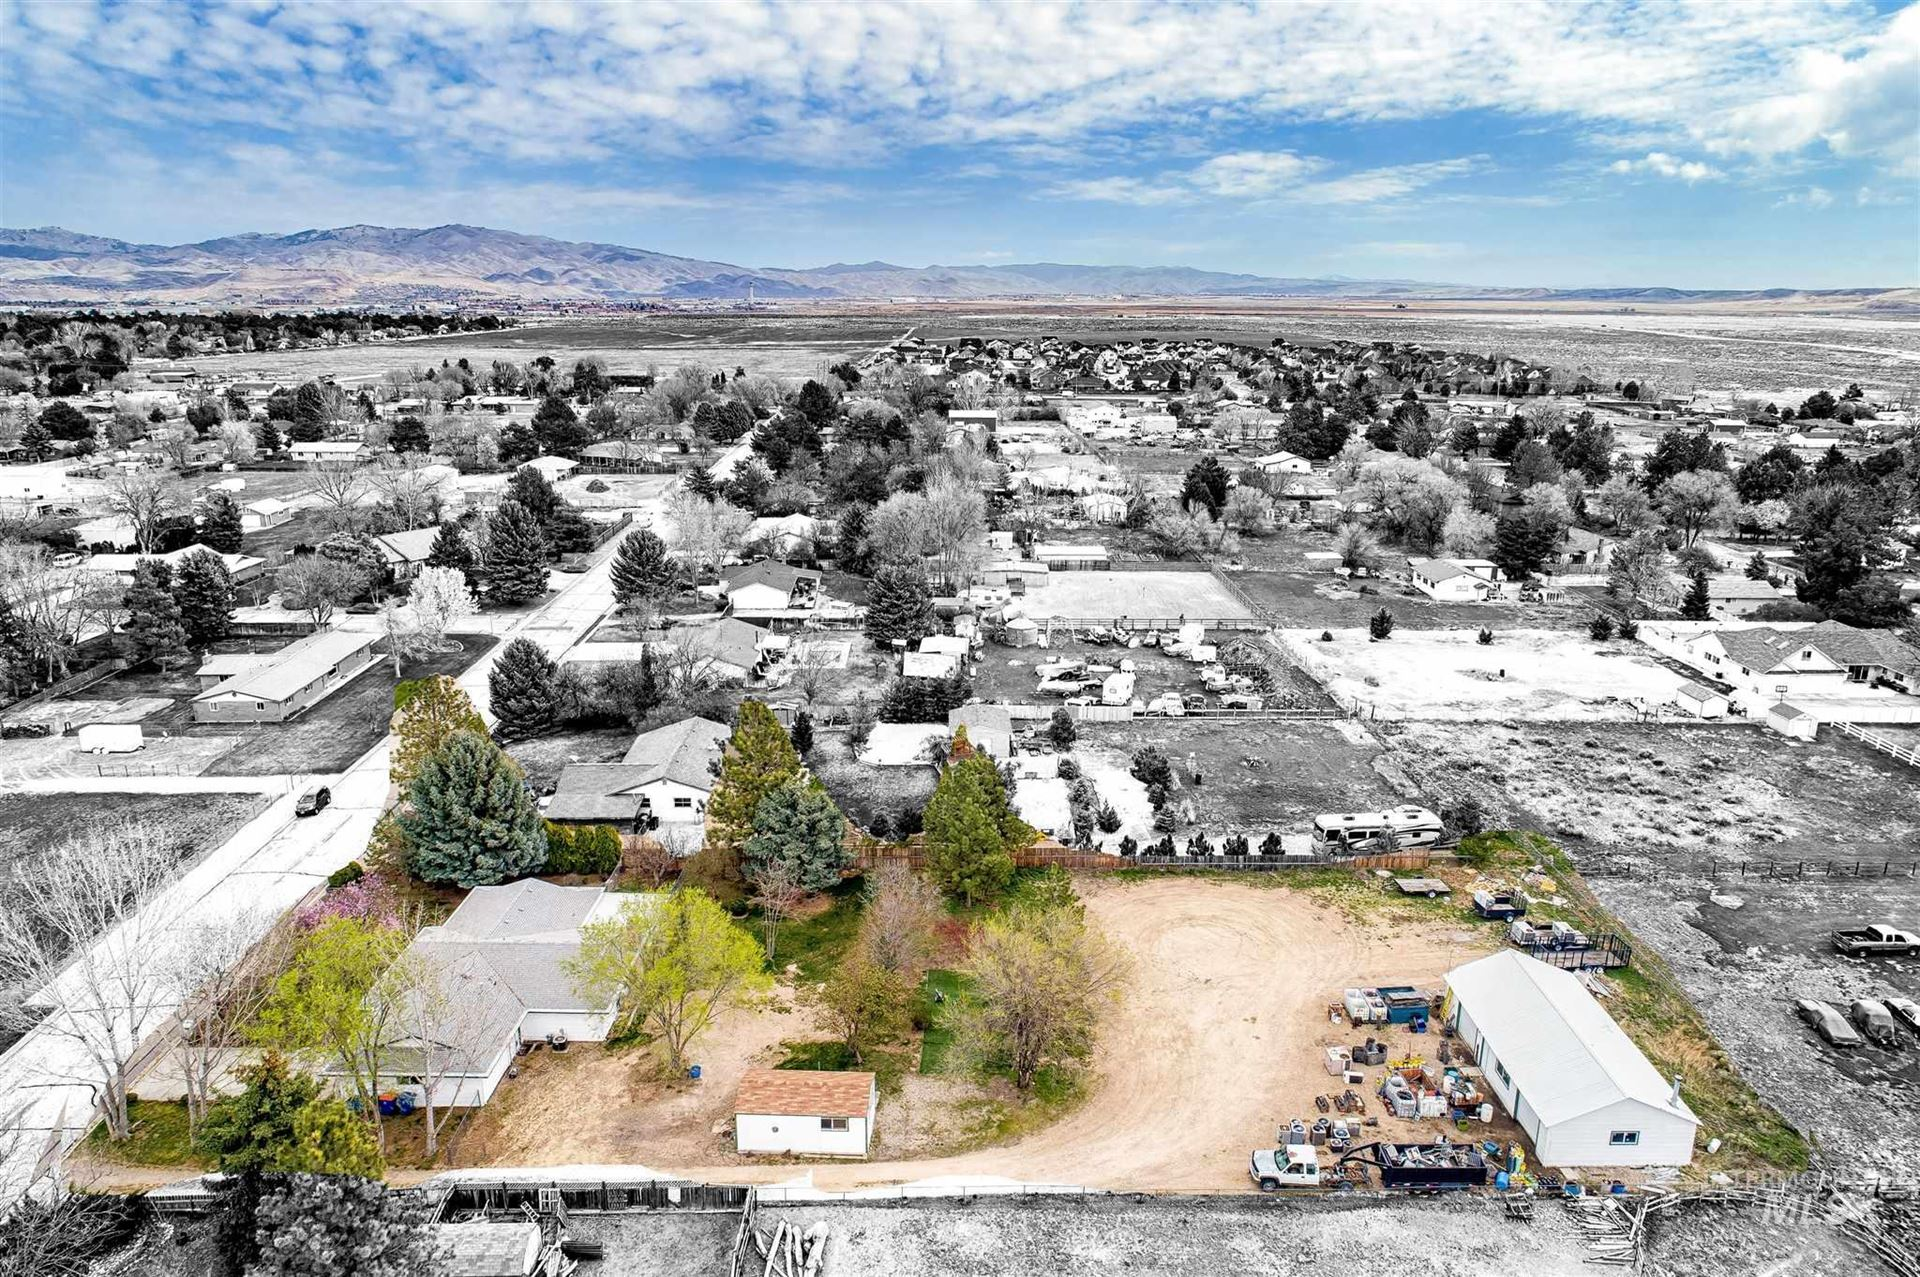 Photo of 7905 W Sagebrush Way, Boise, ID 83709-6431 (MLS # 98798820)